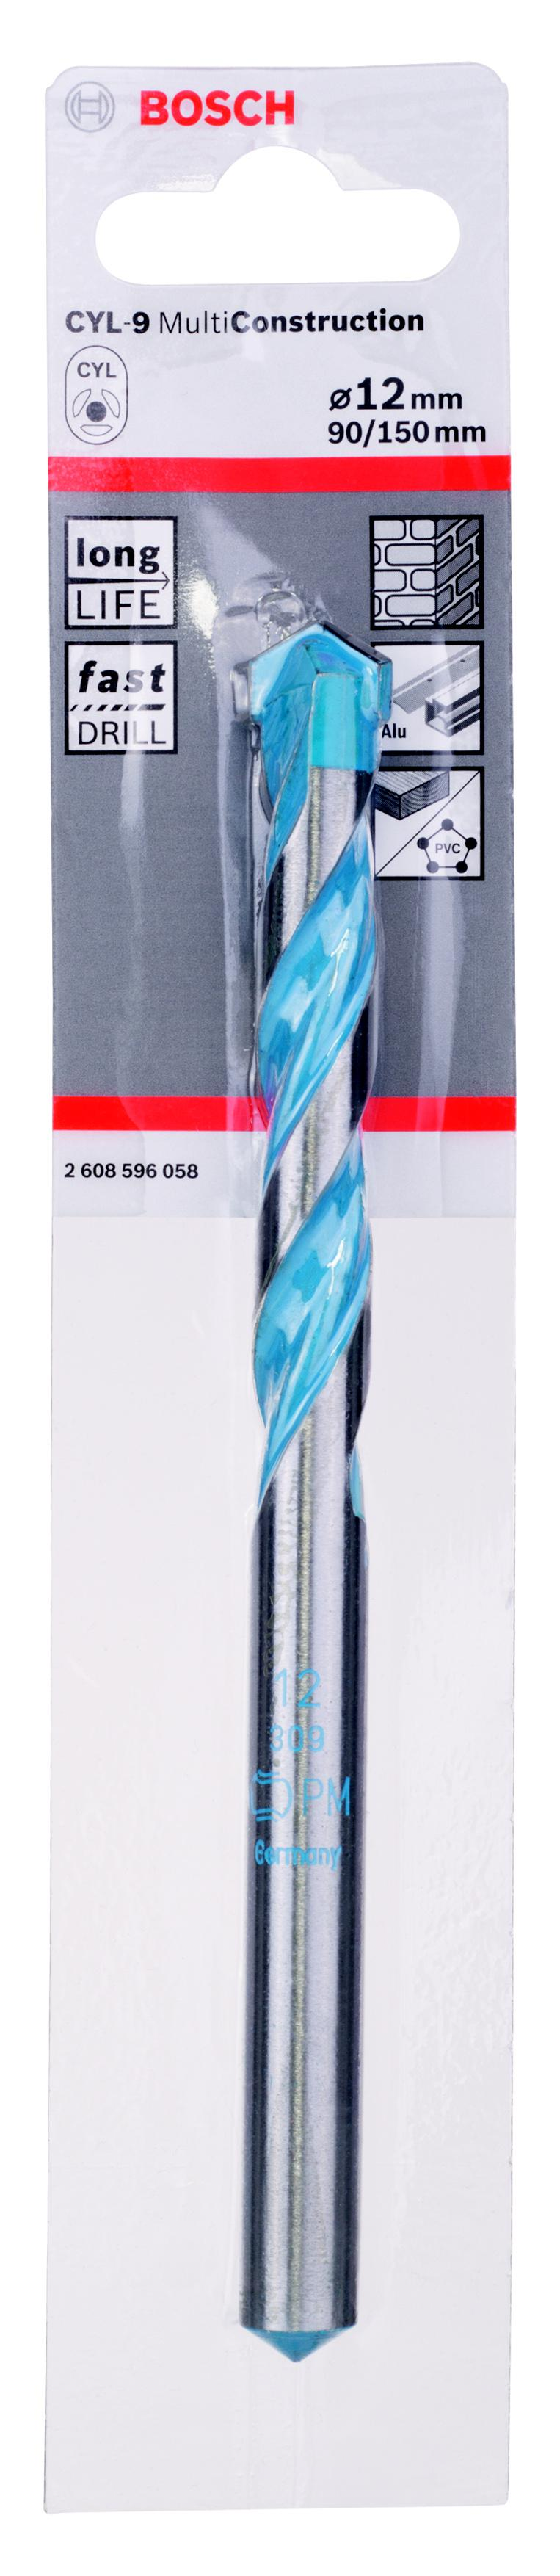 Сверло универсальное Bosch Ф12х150мм (cyl-9 multi construction 2608596058) сверло универсальное bosch multi construction cyl 9 6x100 мм 2608596053